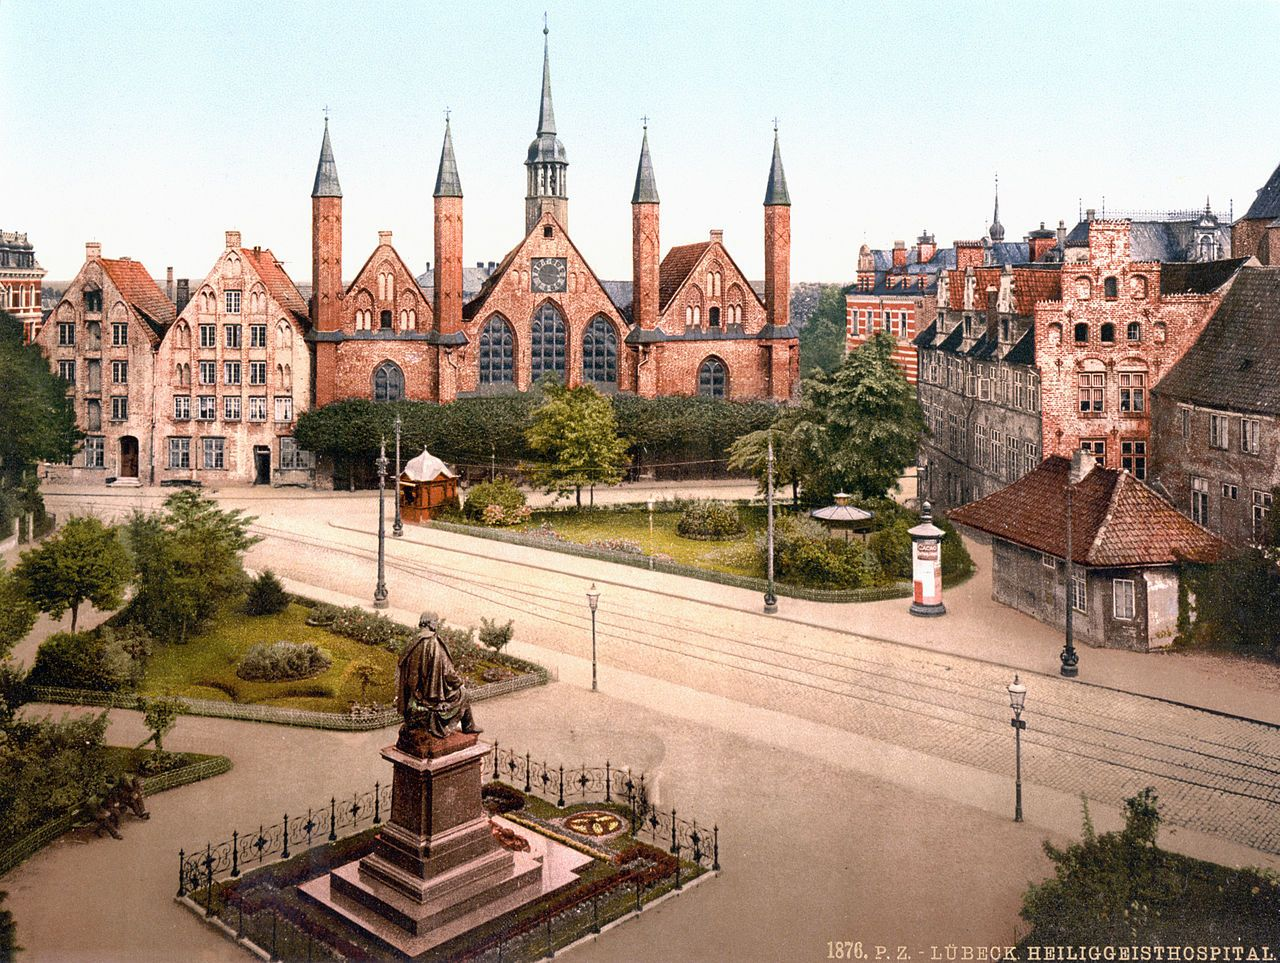 Luebeck Heiliggeisthospital 1900